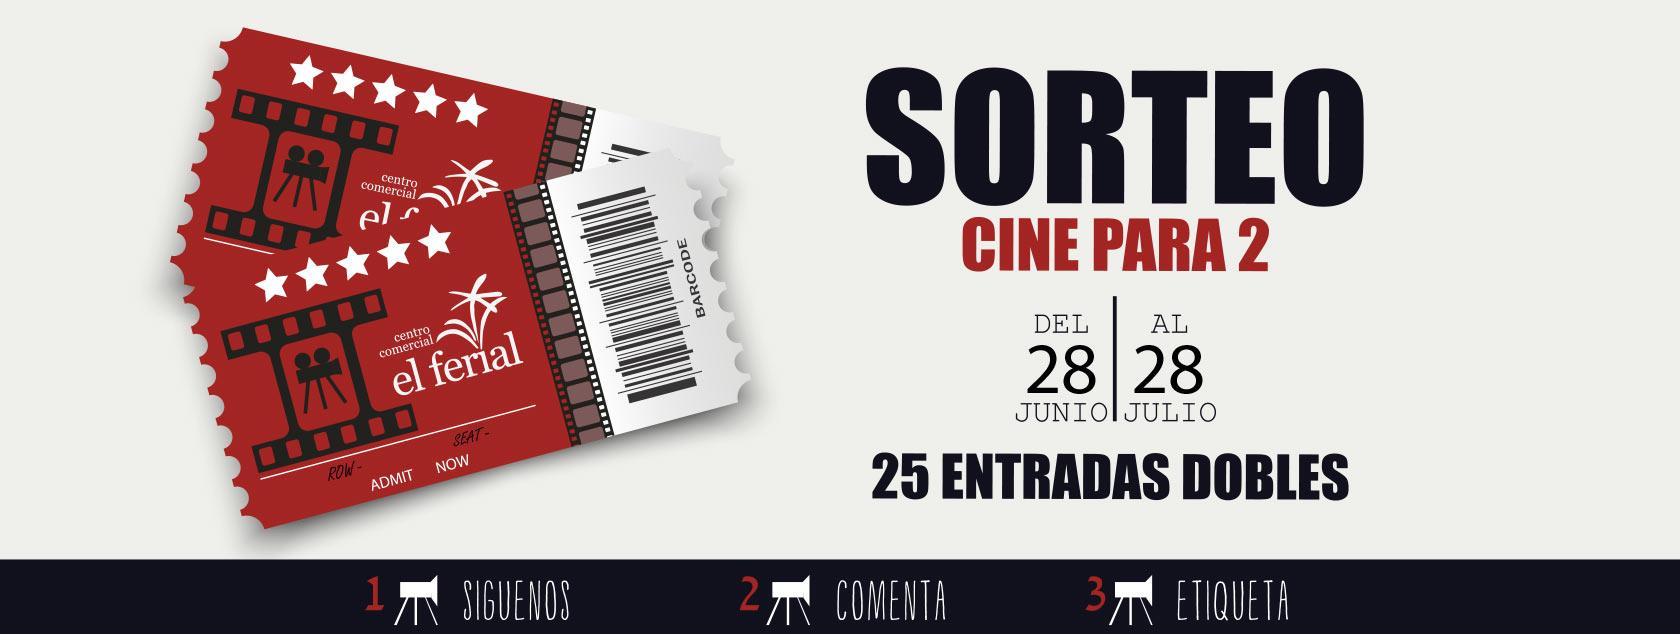 CC El Ferial te invita al cine